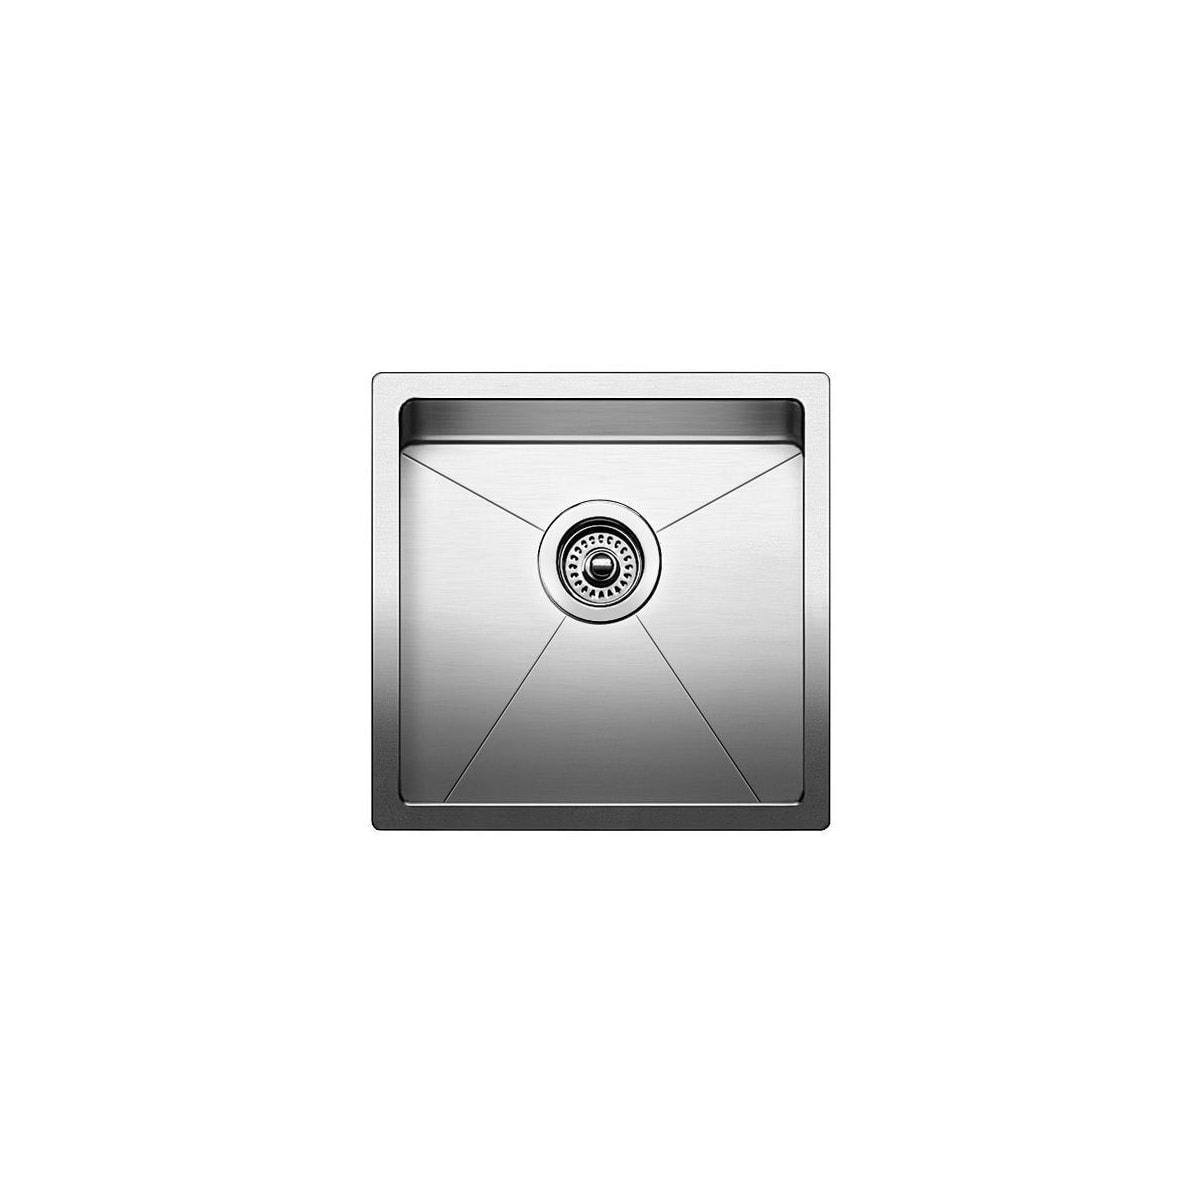 "Blanco Quatrus 15"" Single Basin Undermount Stainless Steel Bar Sink"